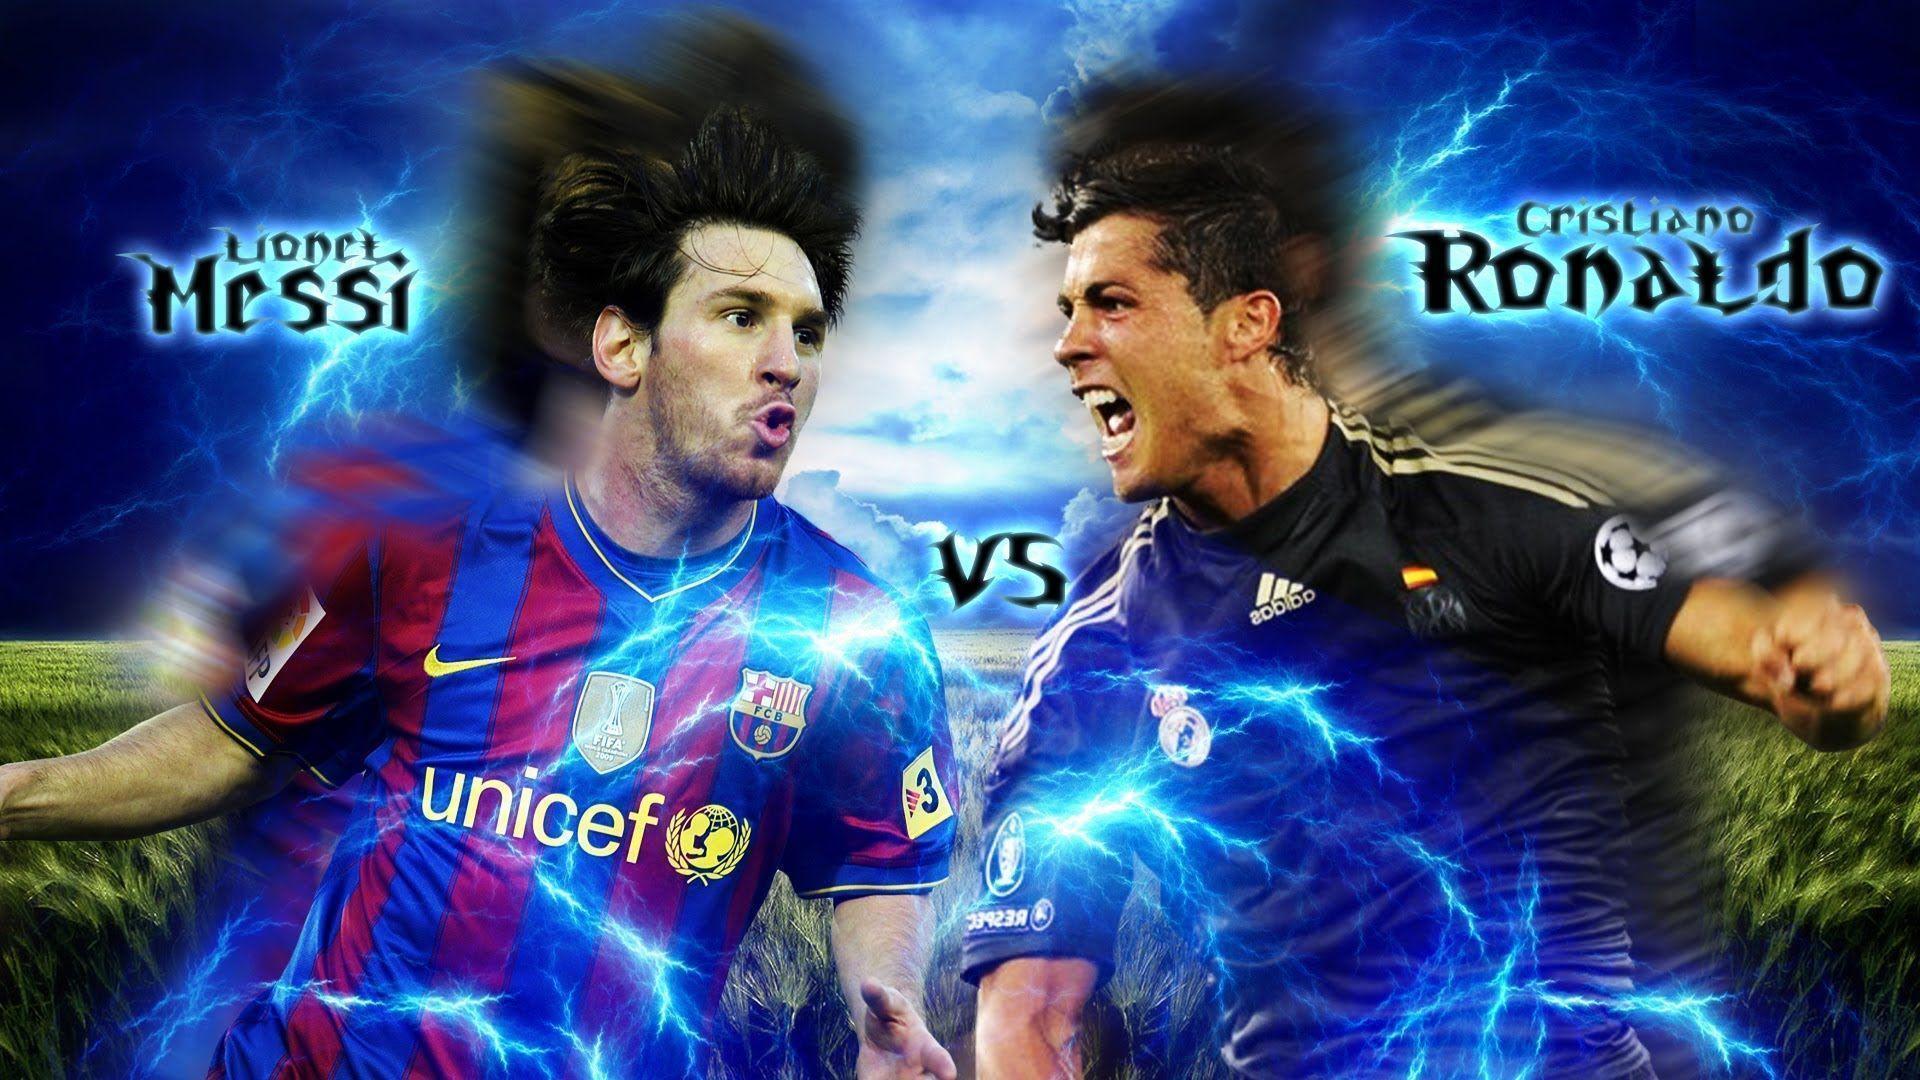 Ronaldo And Messi Wallpapers Wallpaper Cave